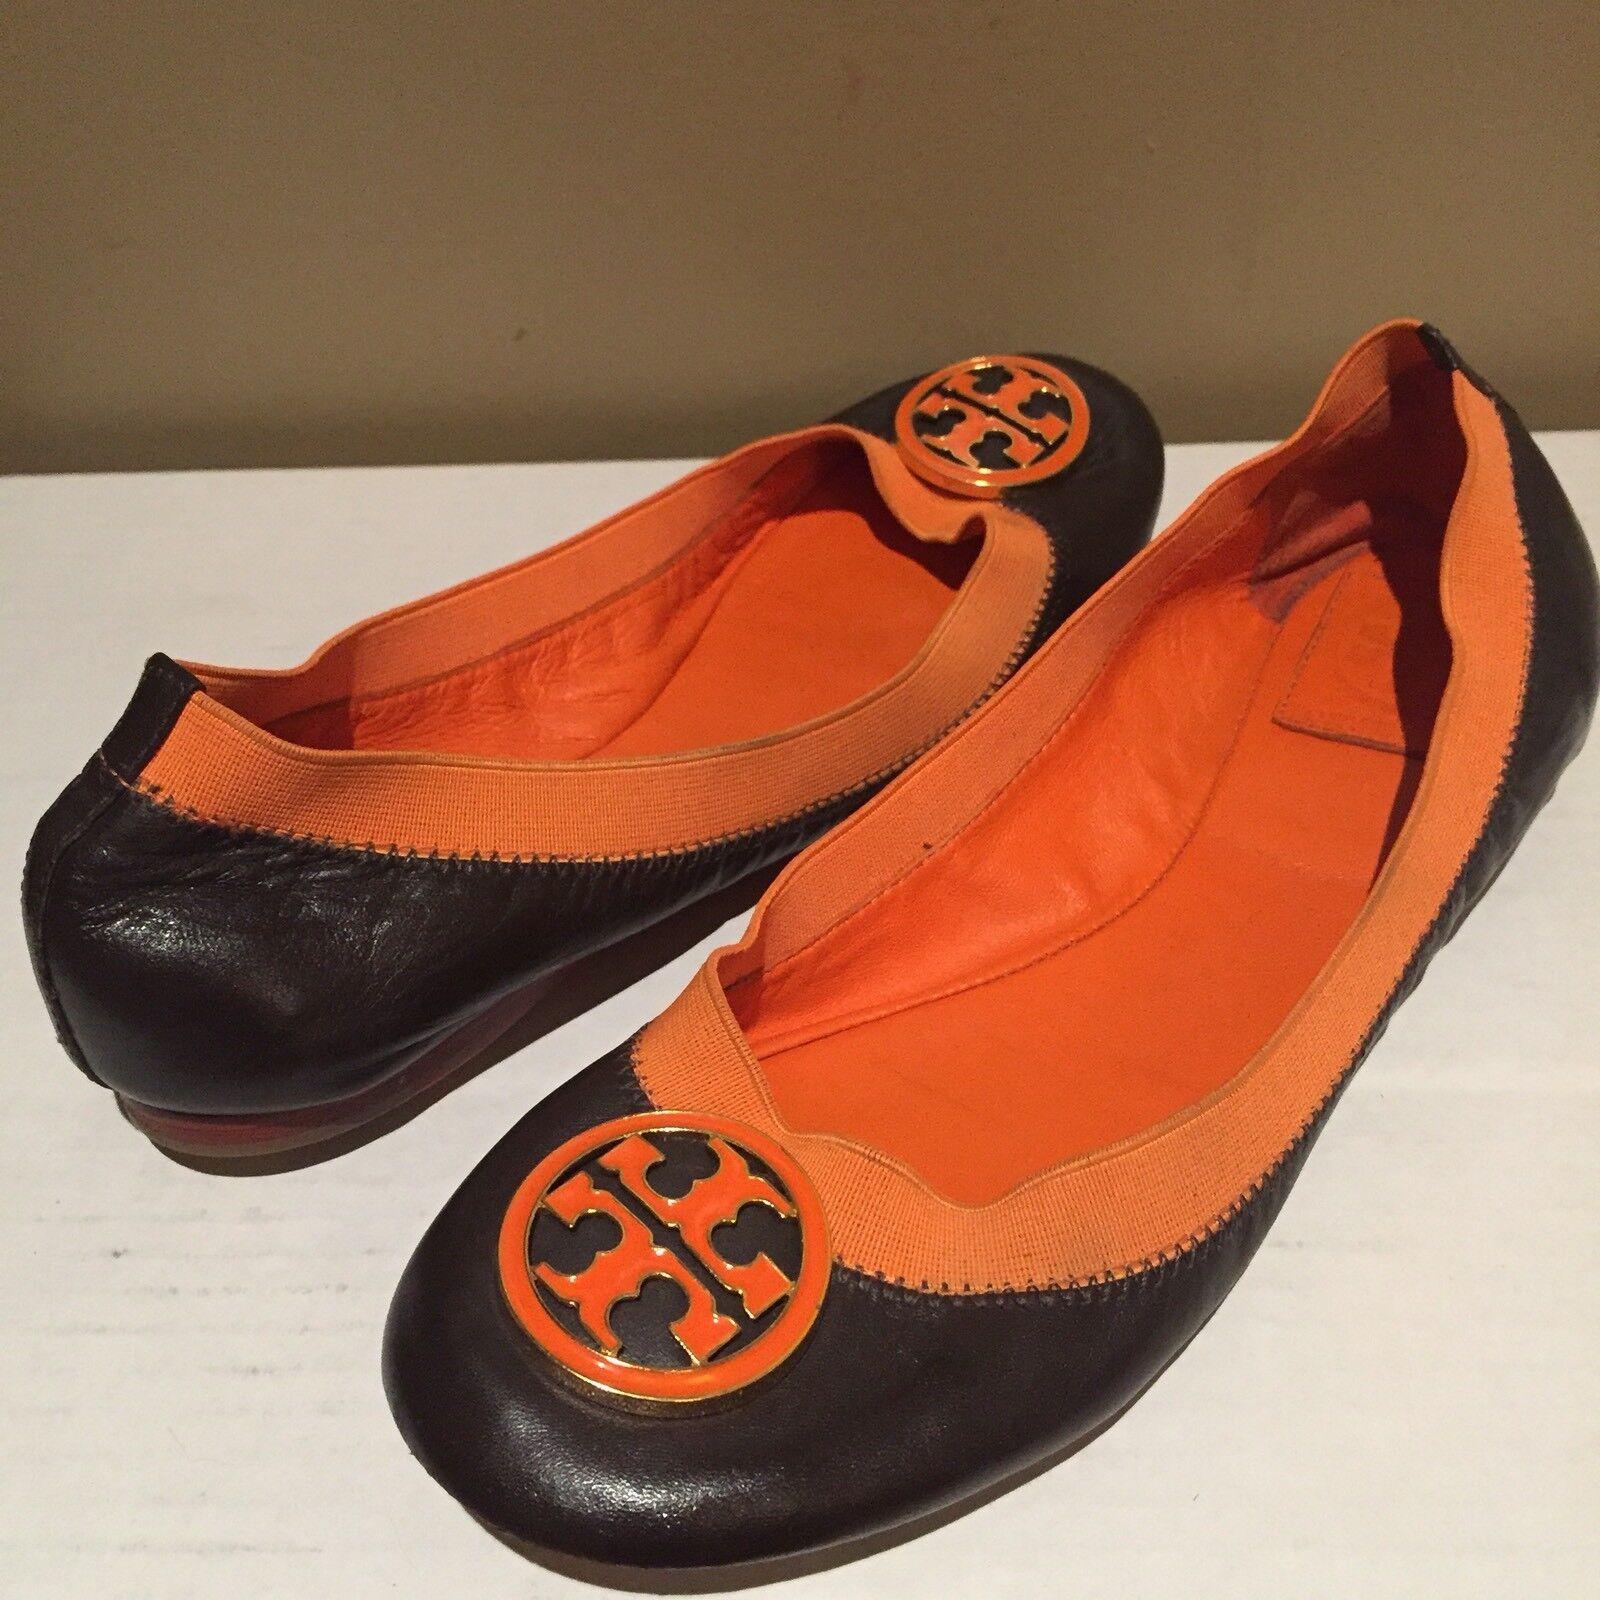 ❤️ TORY BURCH 7 Orange Braun Leder Ballet Flats Schuhes